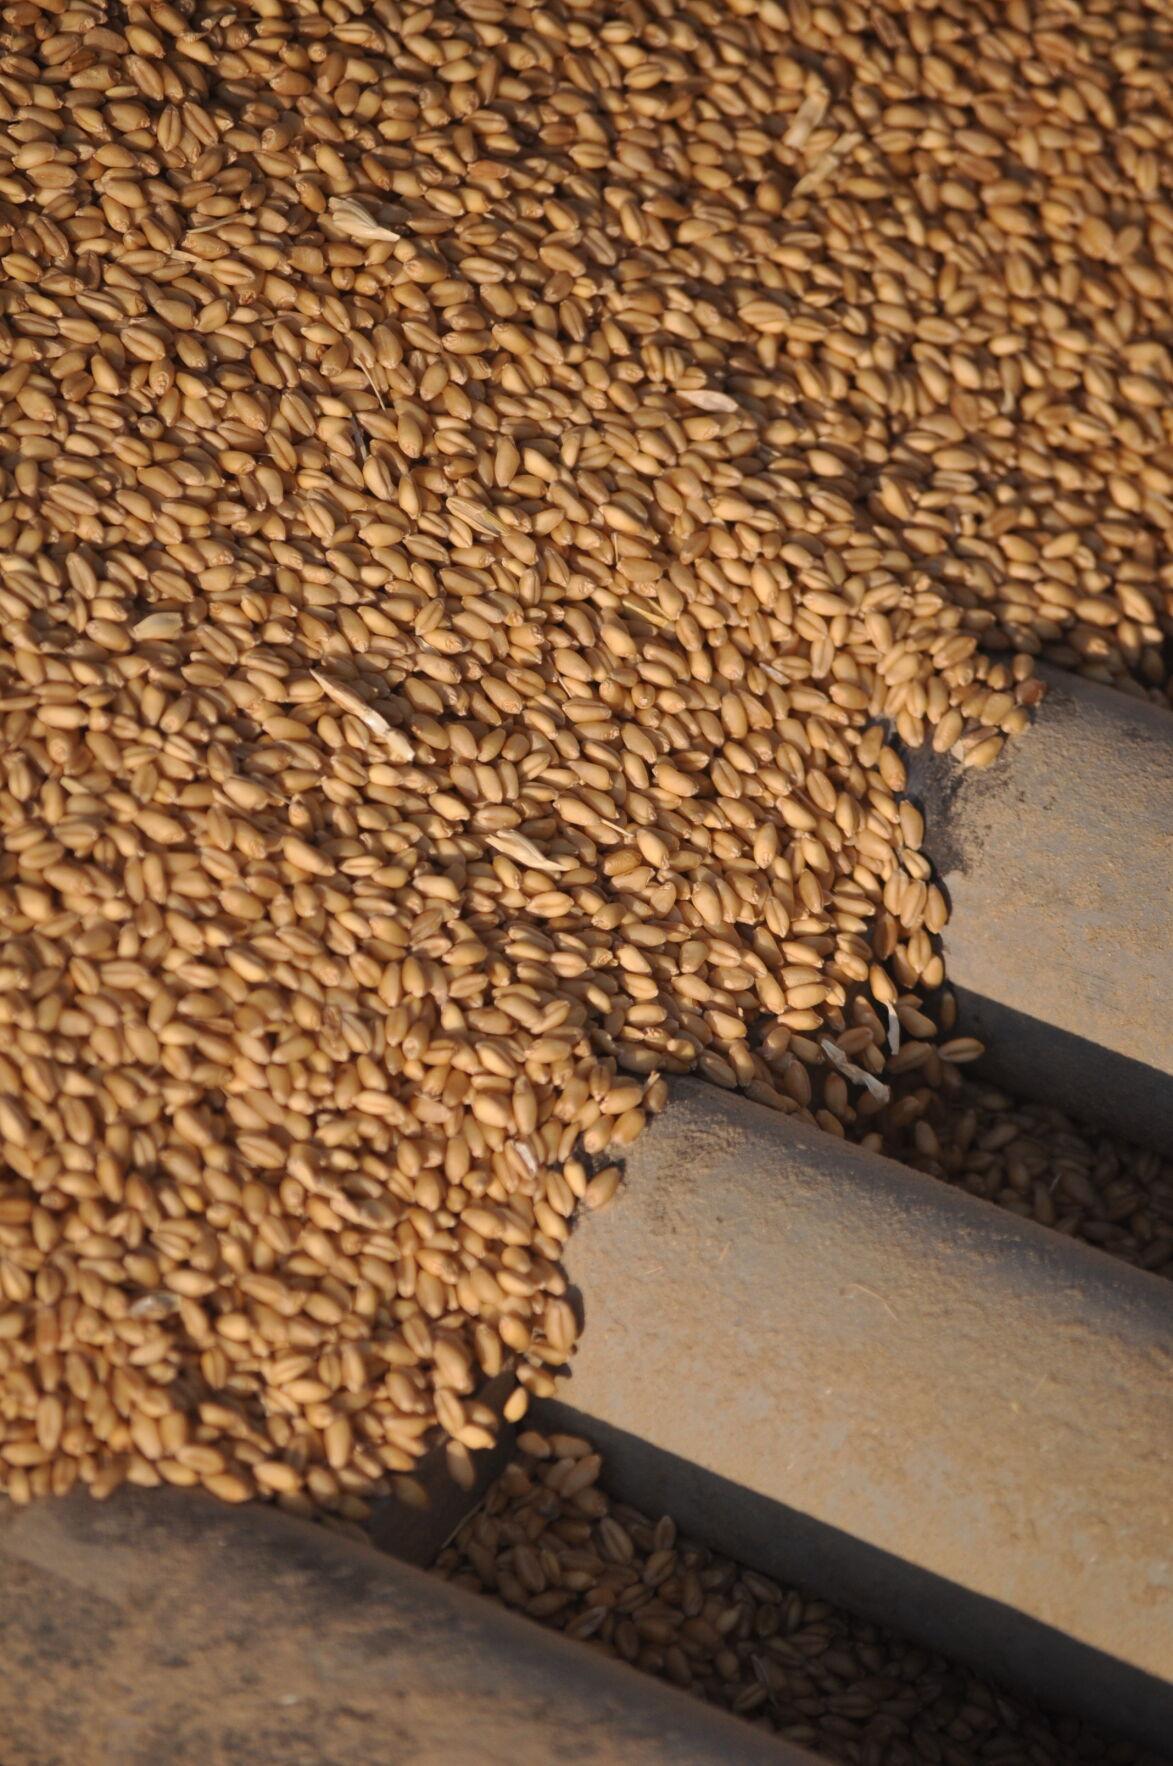 Unloaded grain photo